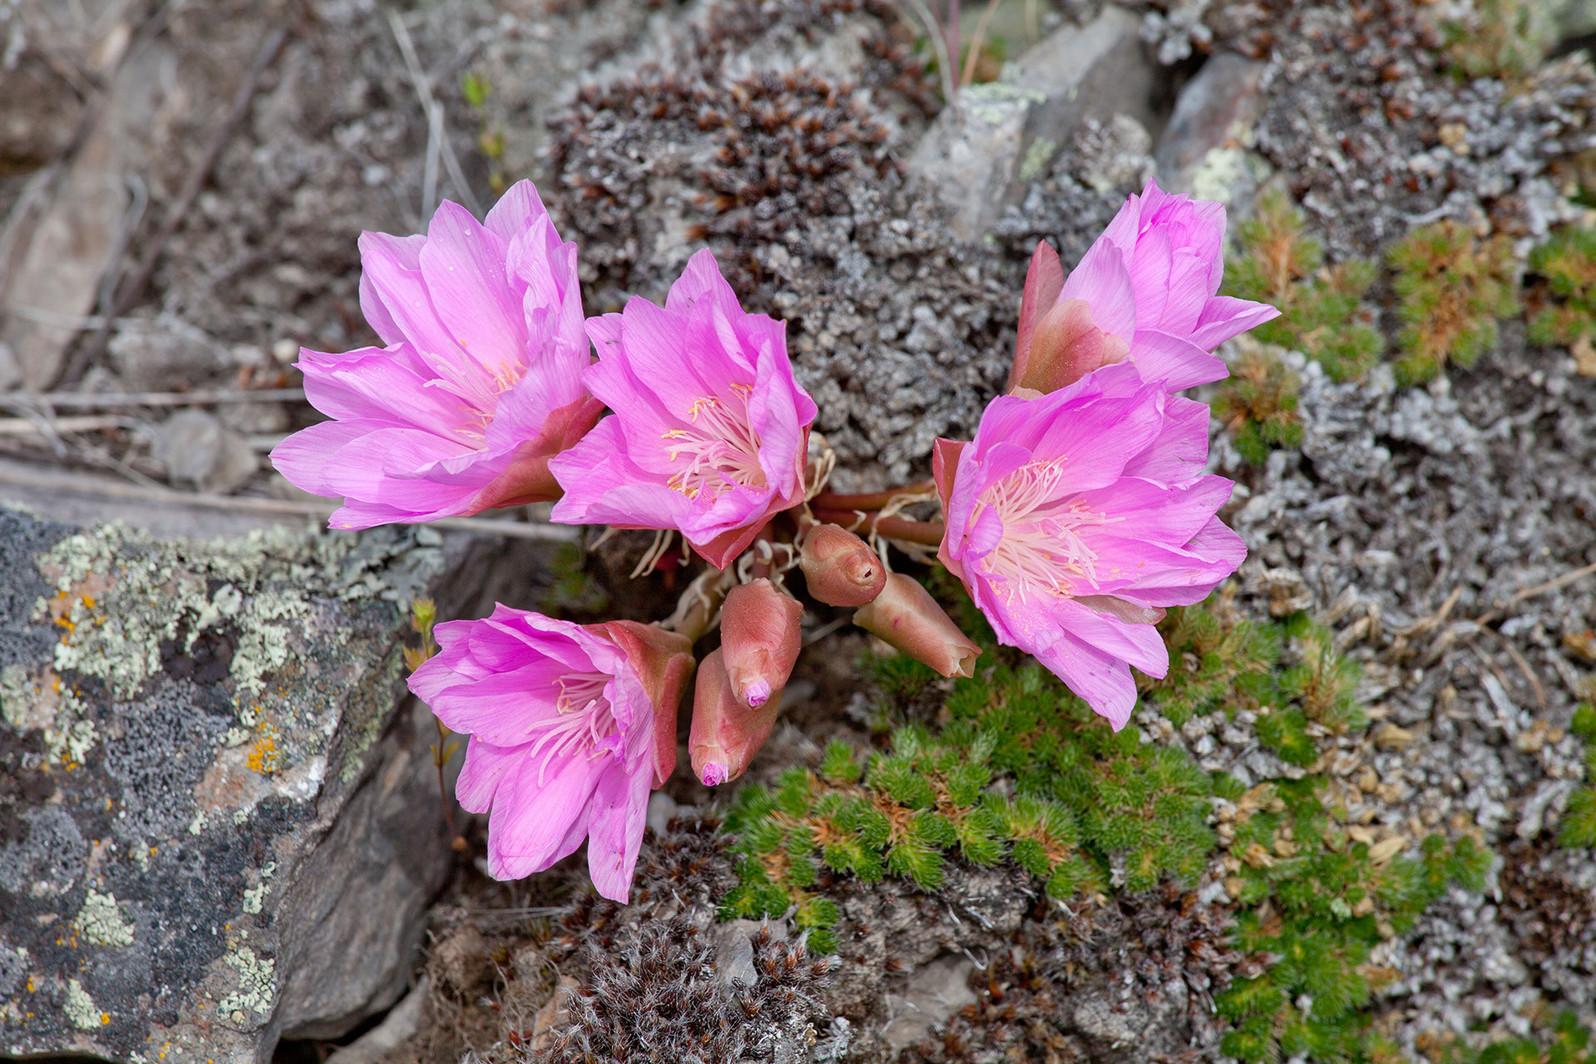 Bitterroot plant in flower